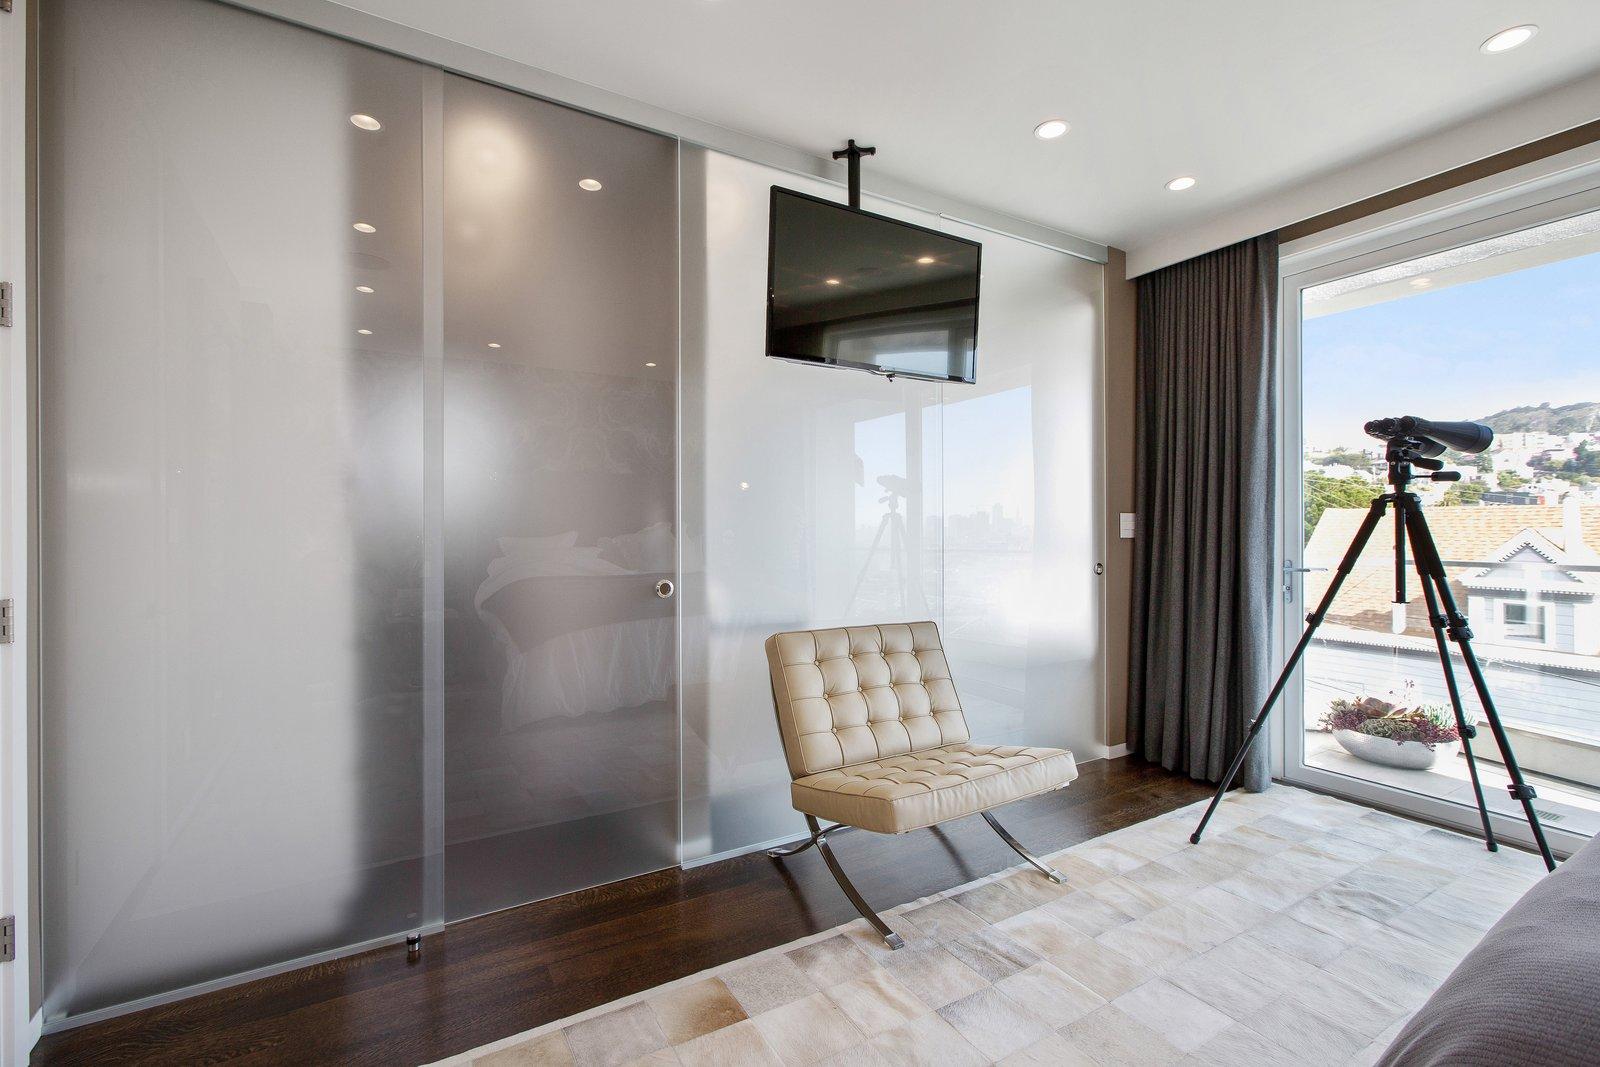 Bedroom, Ceiling Lighting, and Medium Hardwood Floor  LEED Platinum House in SF by DNM Architecture